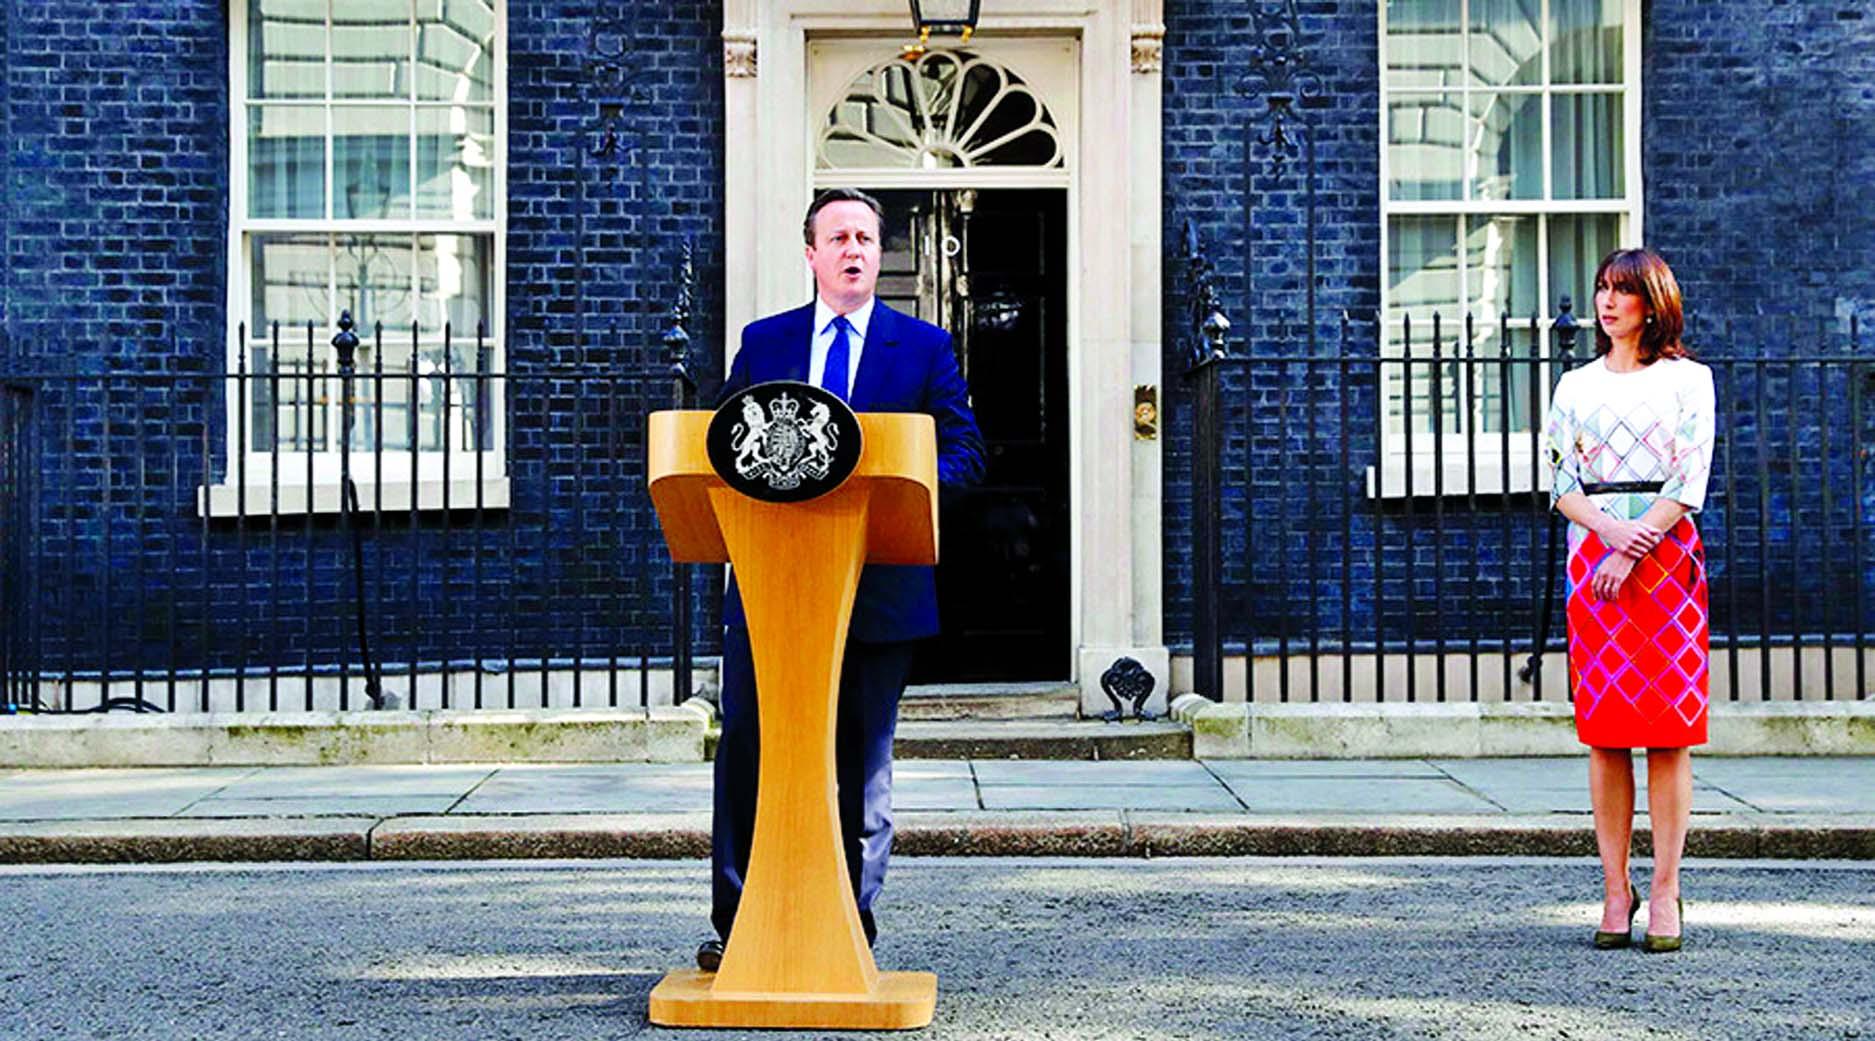 UK votes to leave EU: Cameron offers resignation